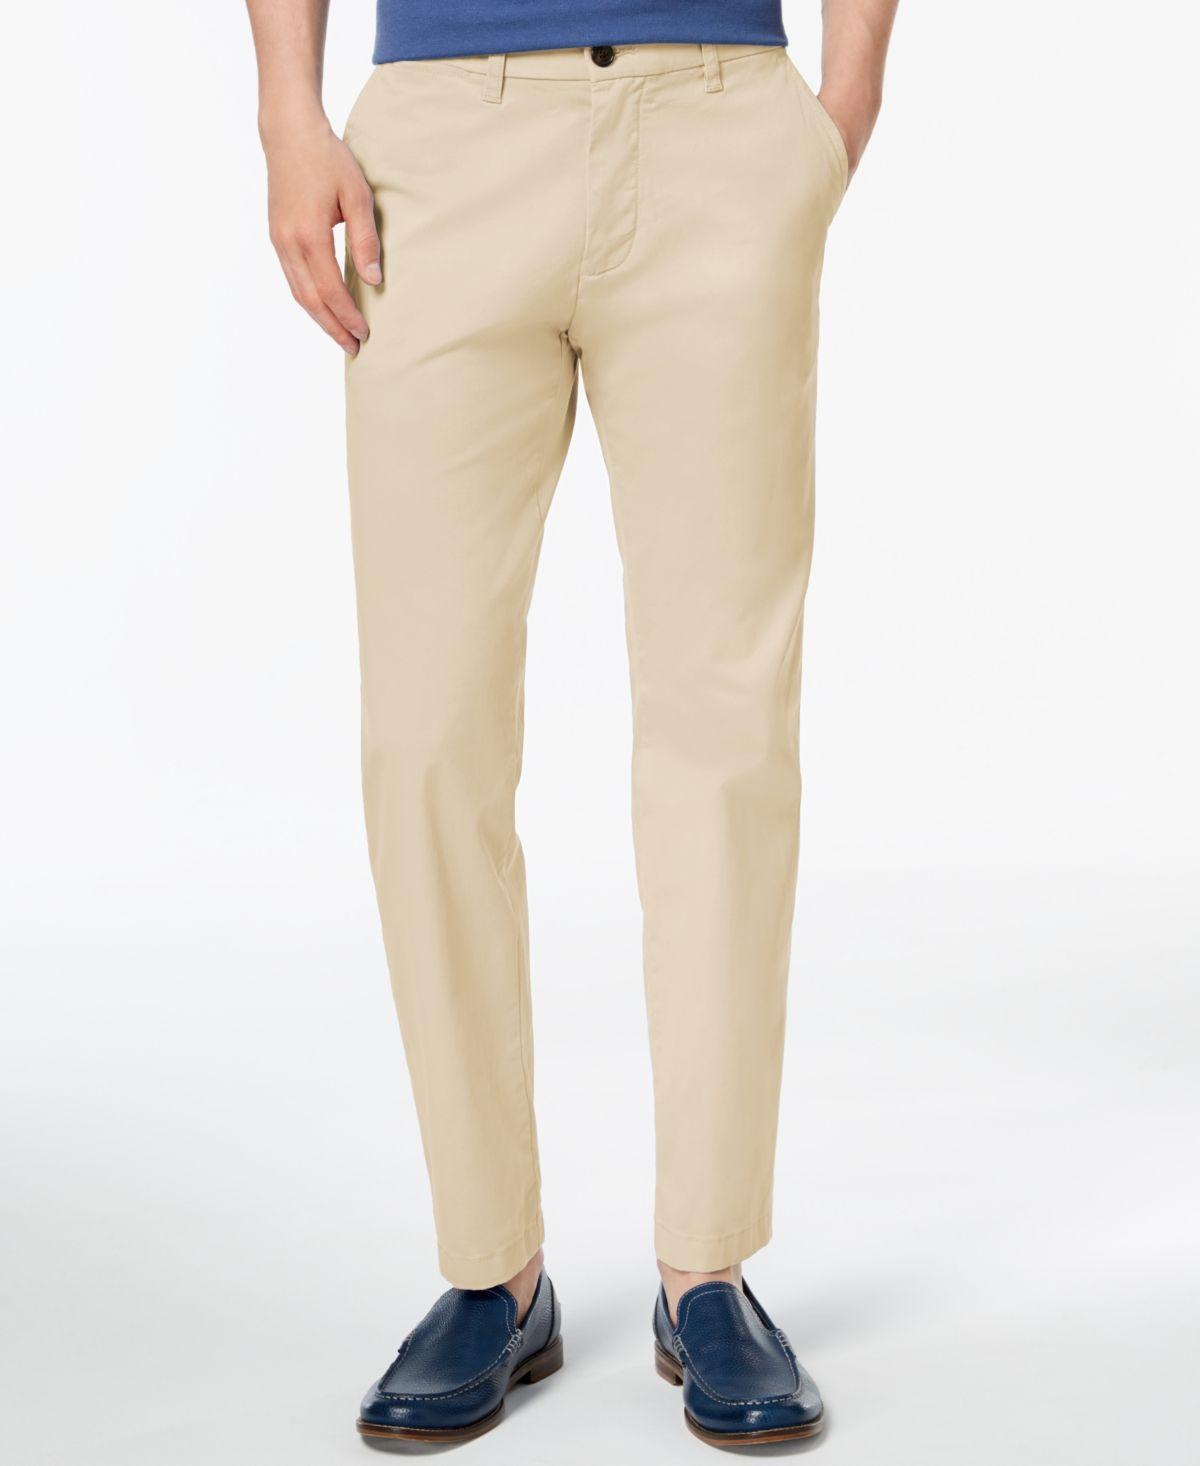 Tommy Hilfiger Men/'s Th Flex Stretch Custom-Fit Chino Pants